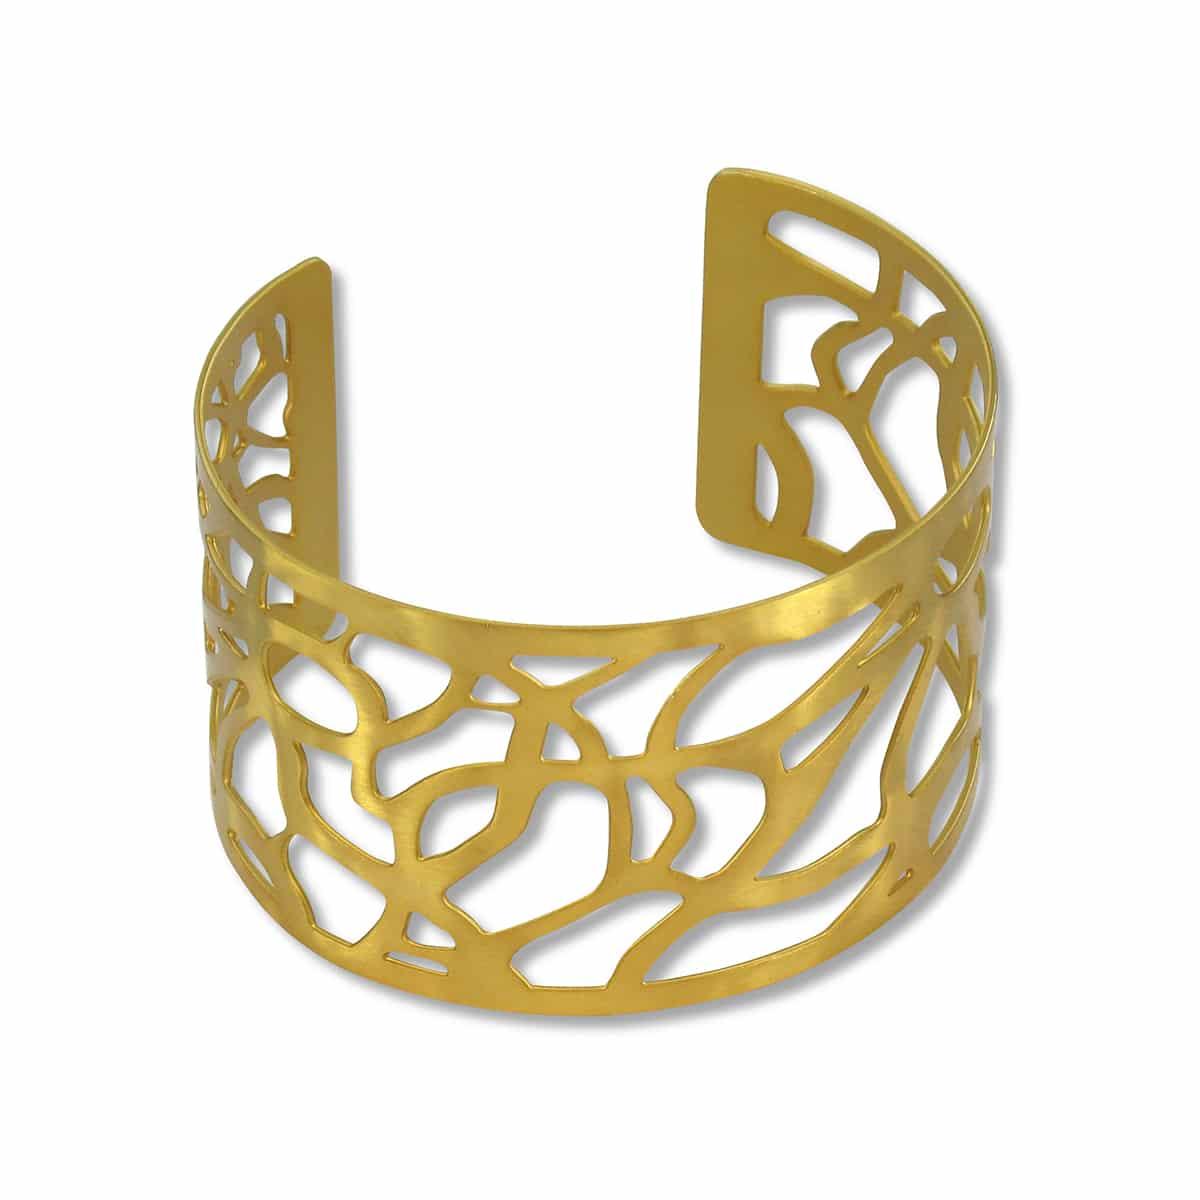 RAS – Lianas armband, guld